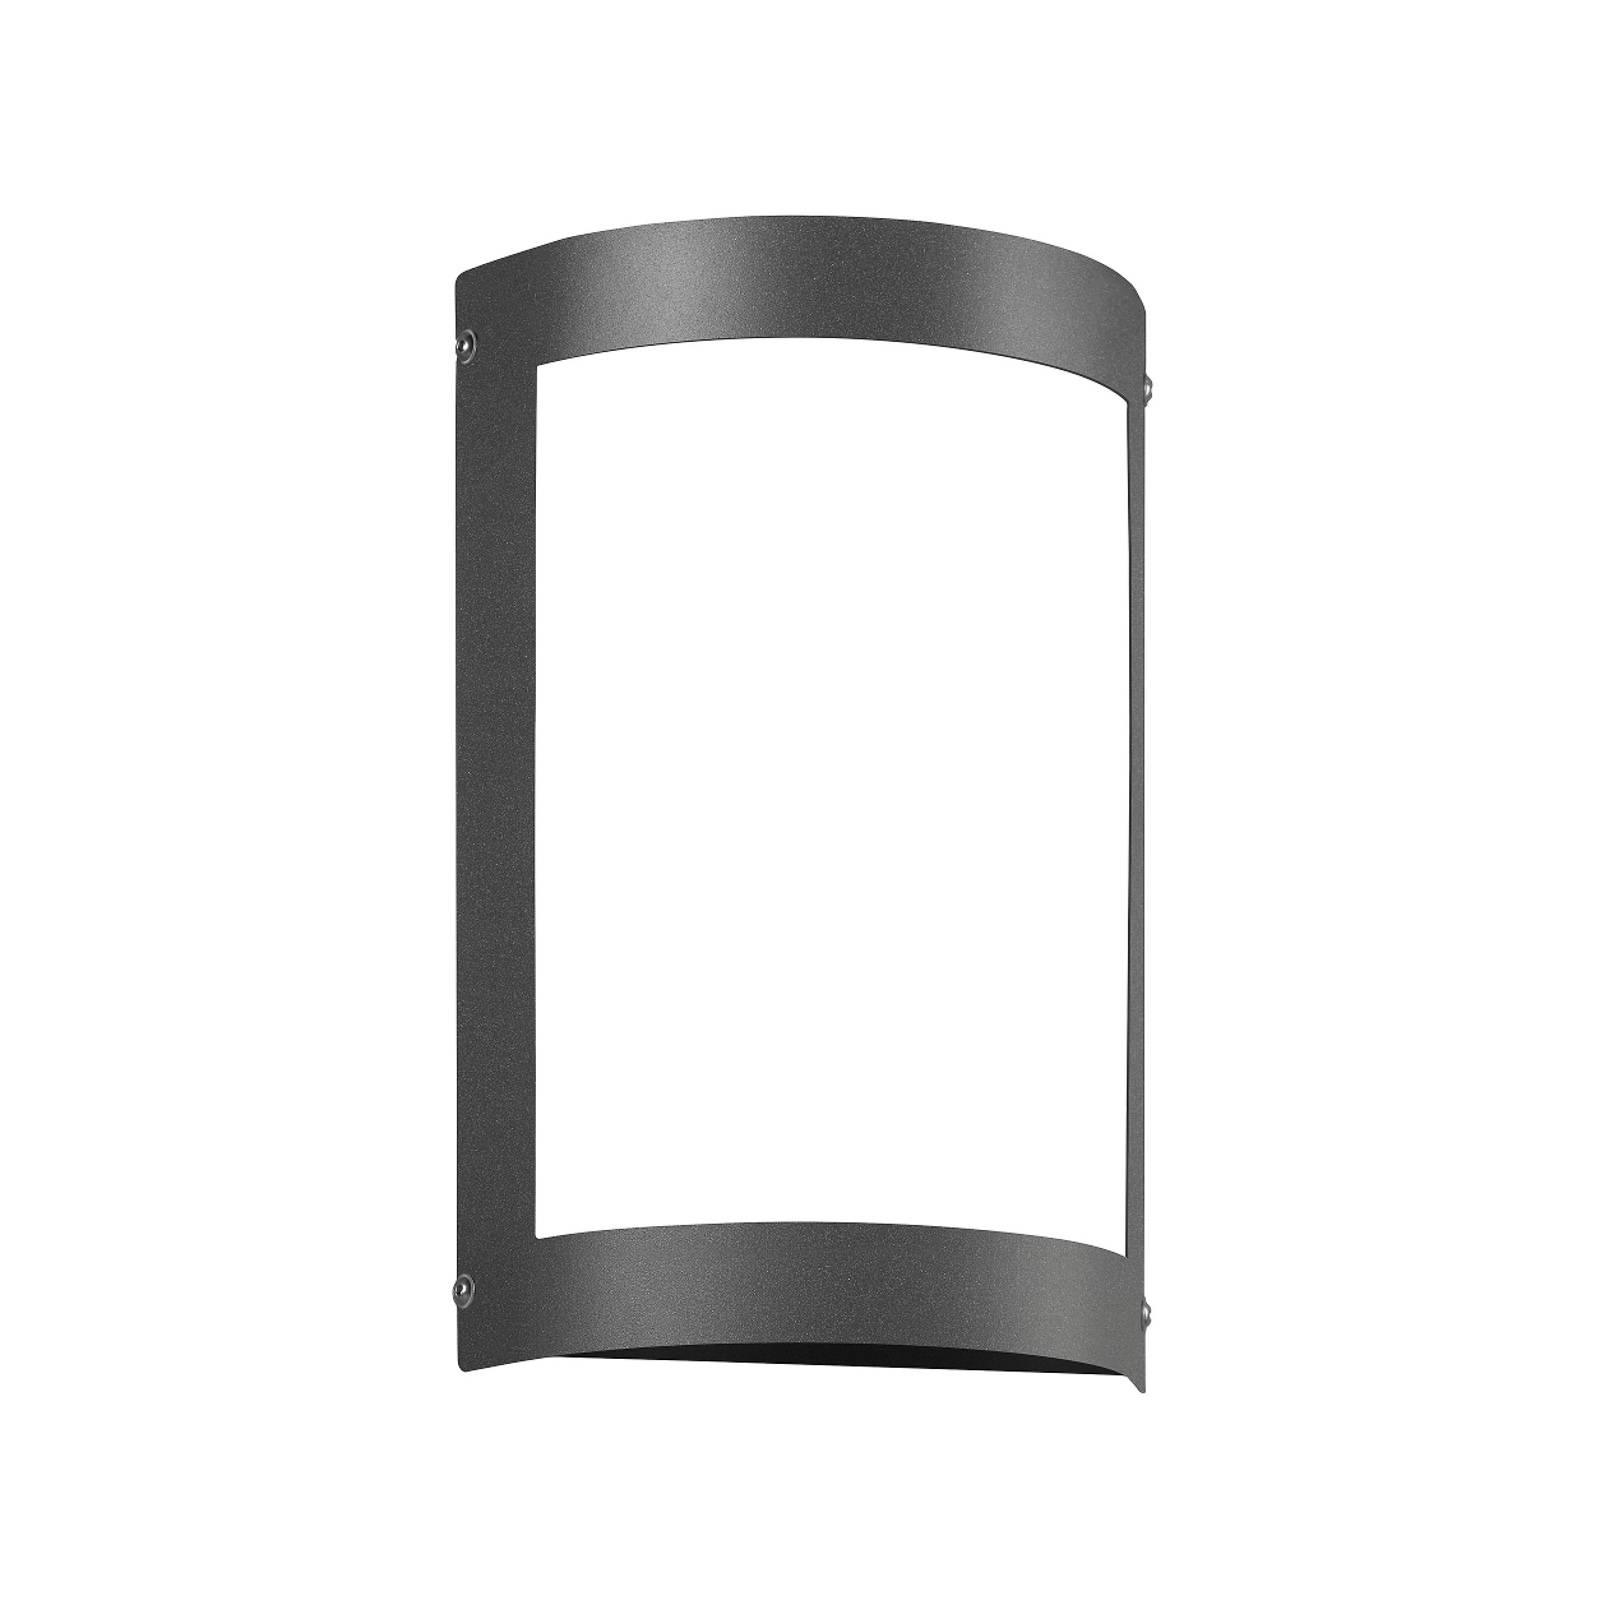 Sensor-LED-Leuchte Aqua Marco, anthrazit